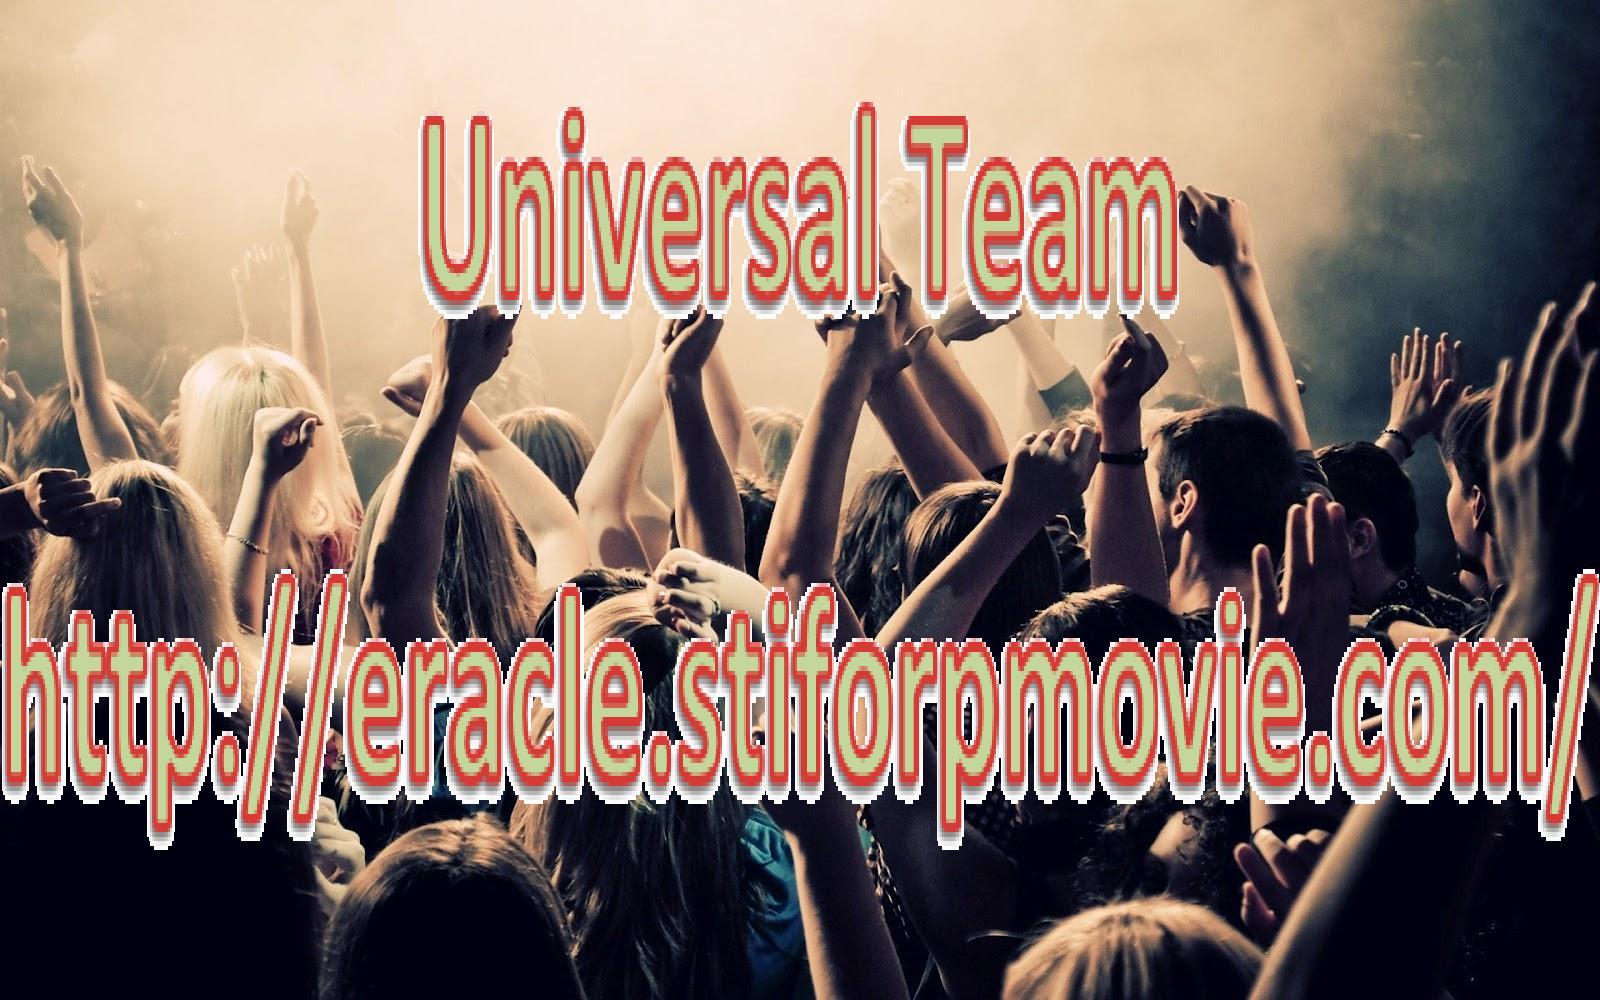 Universal Team Stiforp Profits